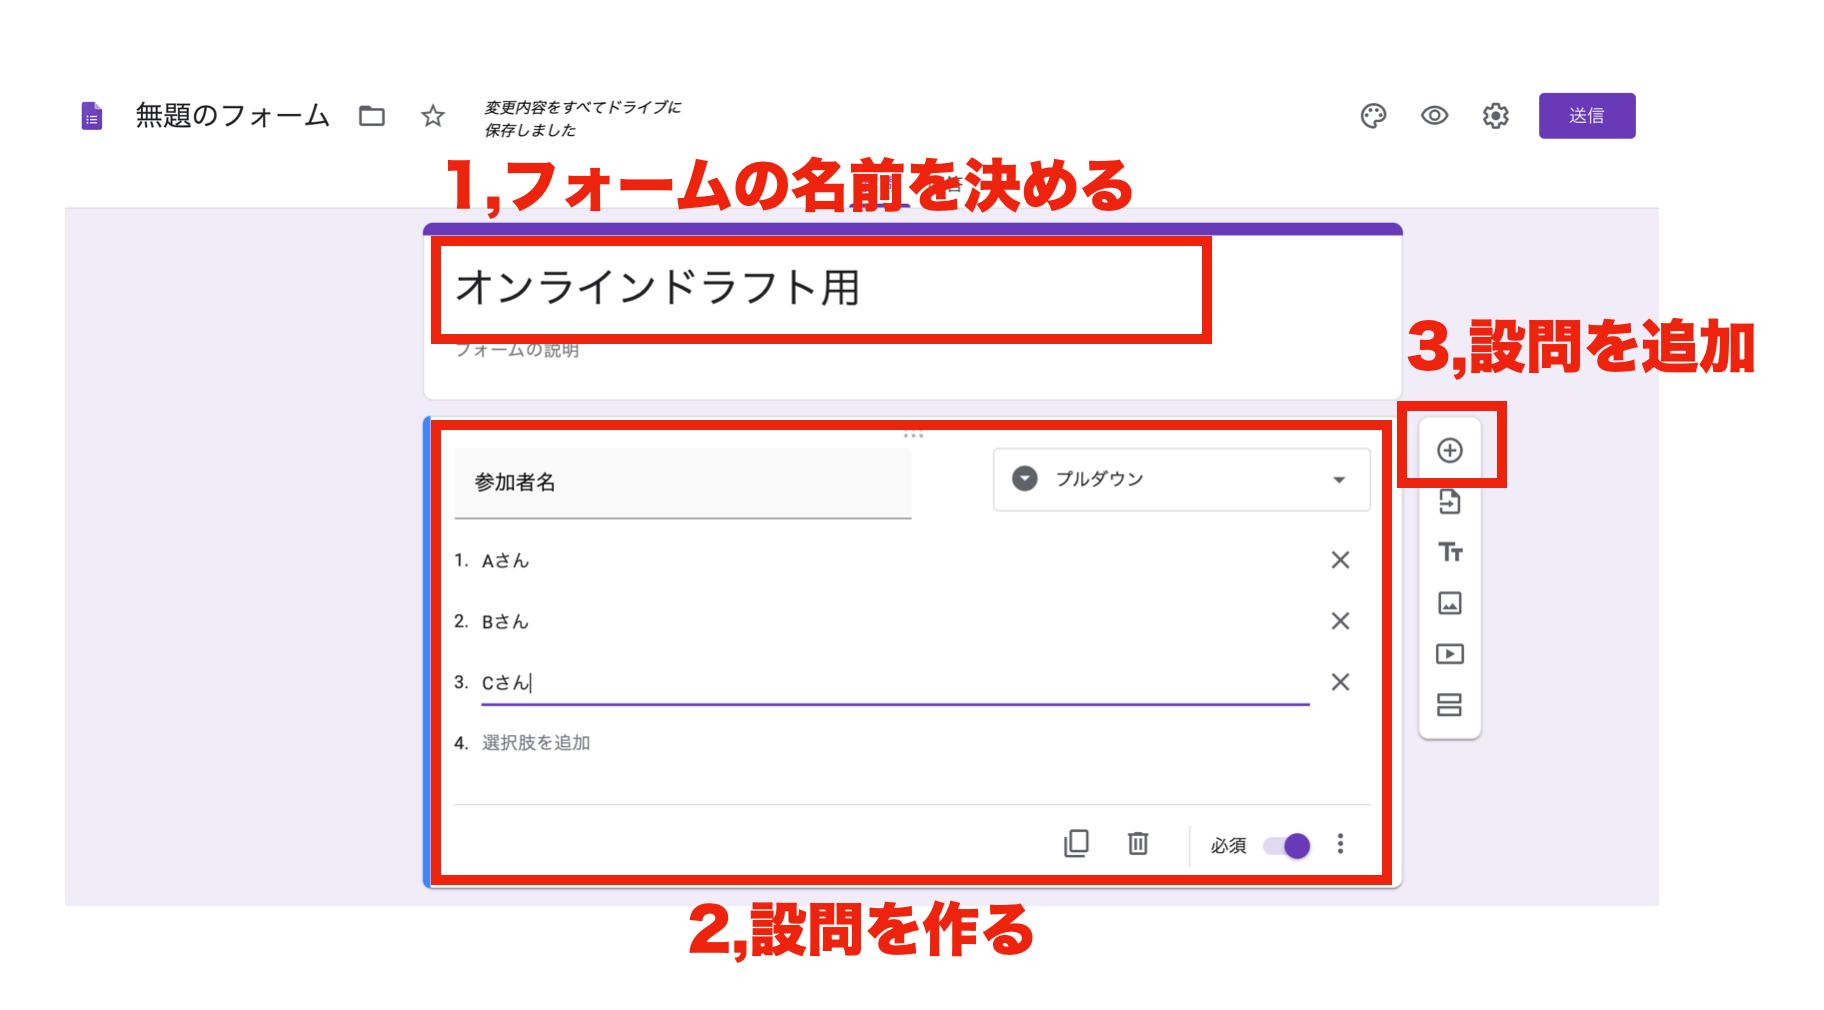 【POG】オンラインドラフト(リモートドラフト)入札ツールの作り方1